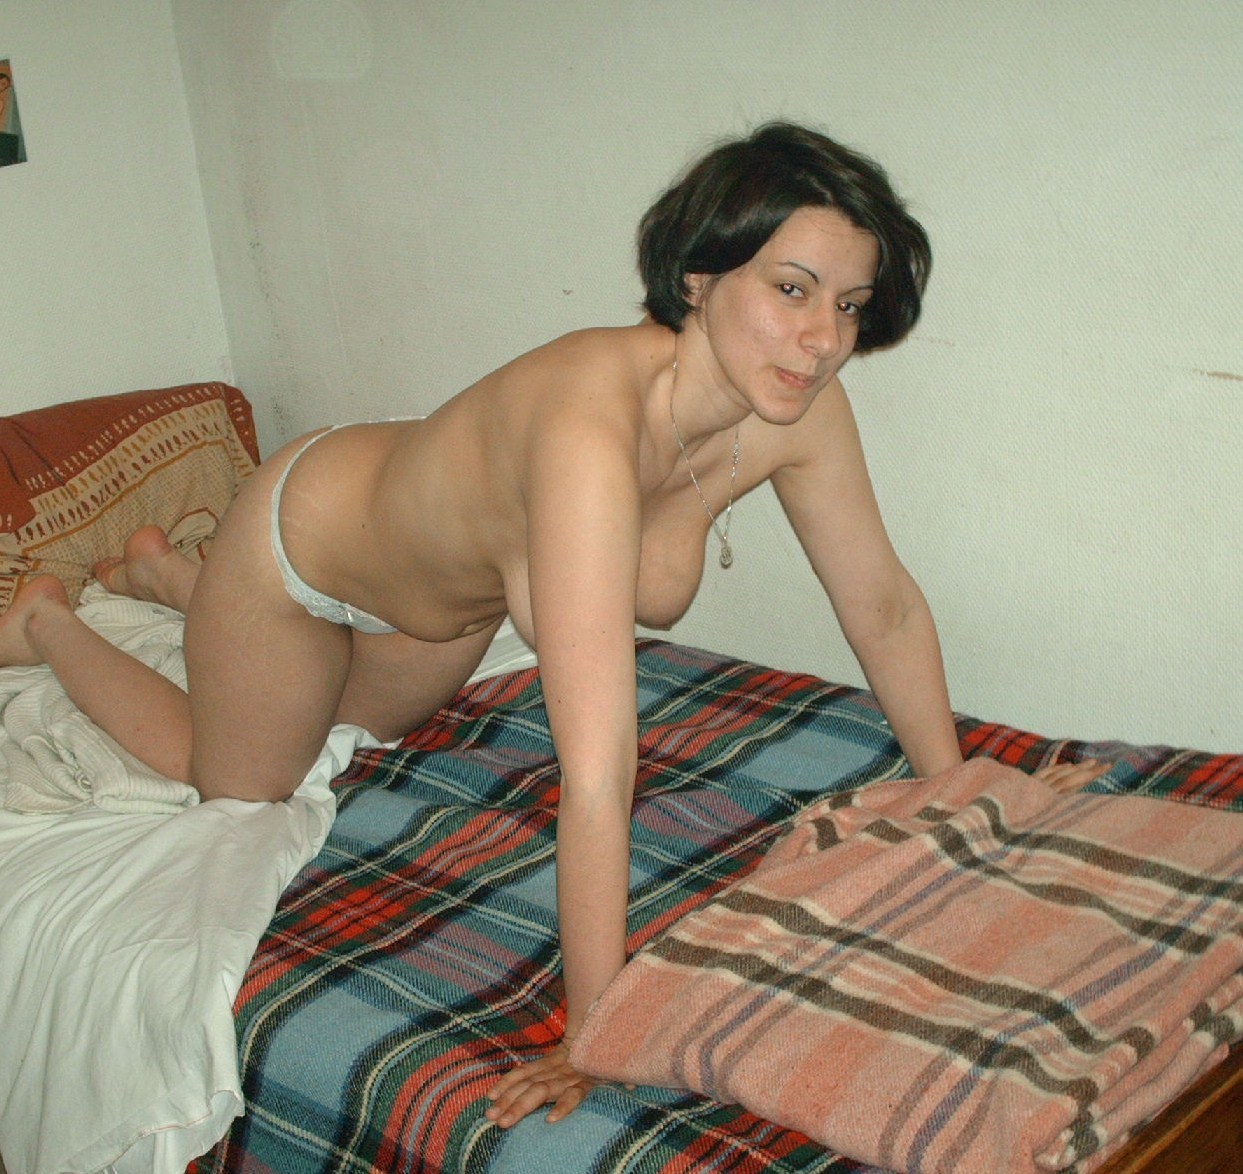 ablama masaj 1  Hikaye Erotikx  Sex hikayeleri Sikiş